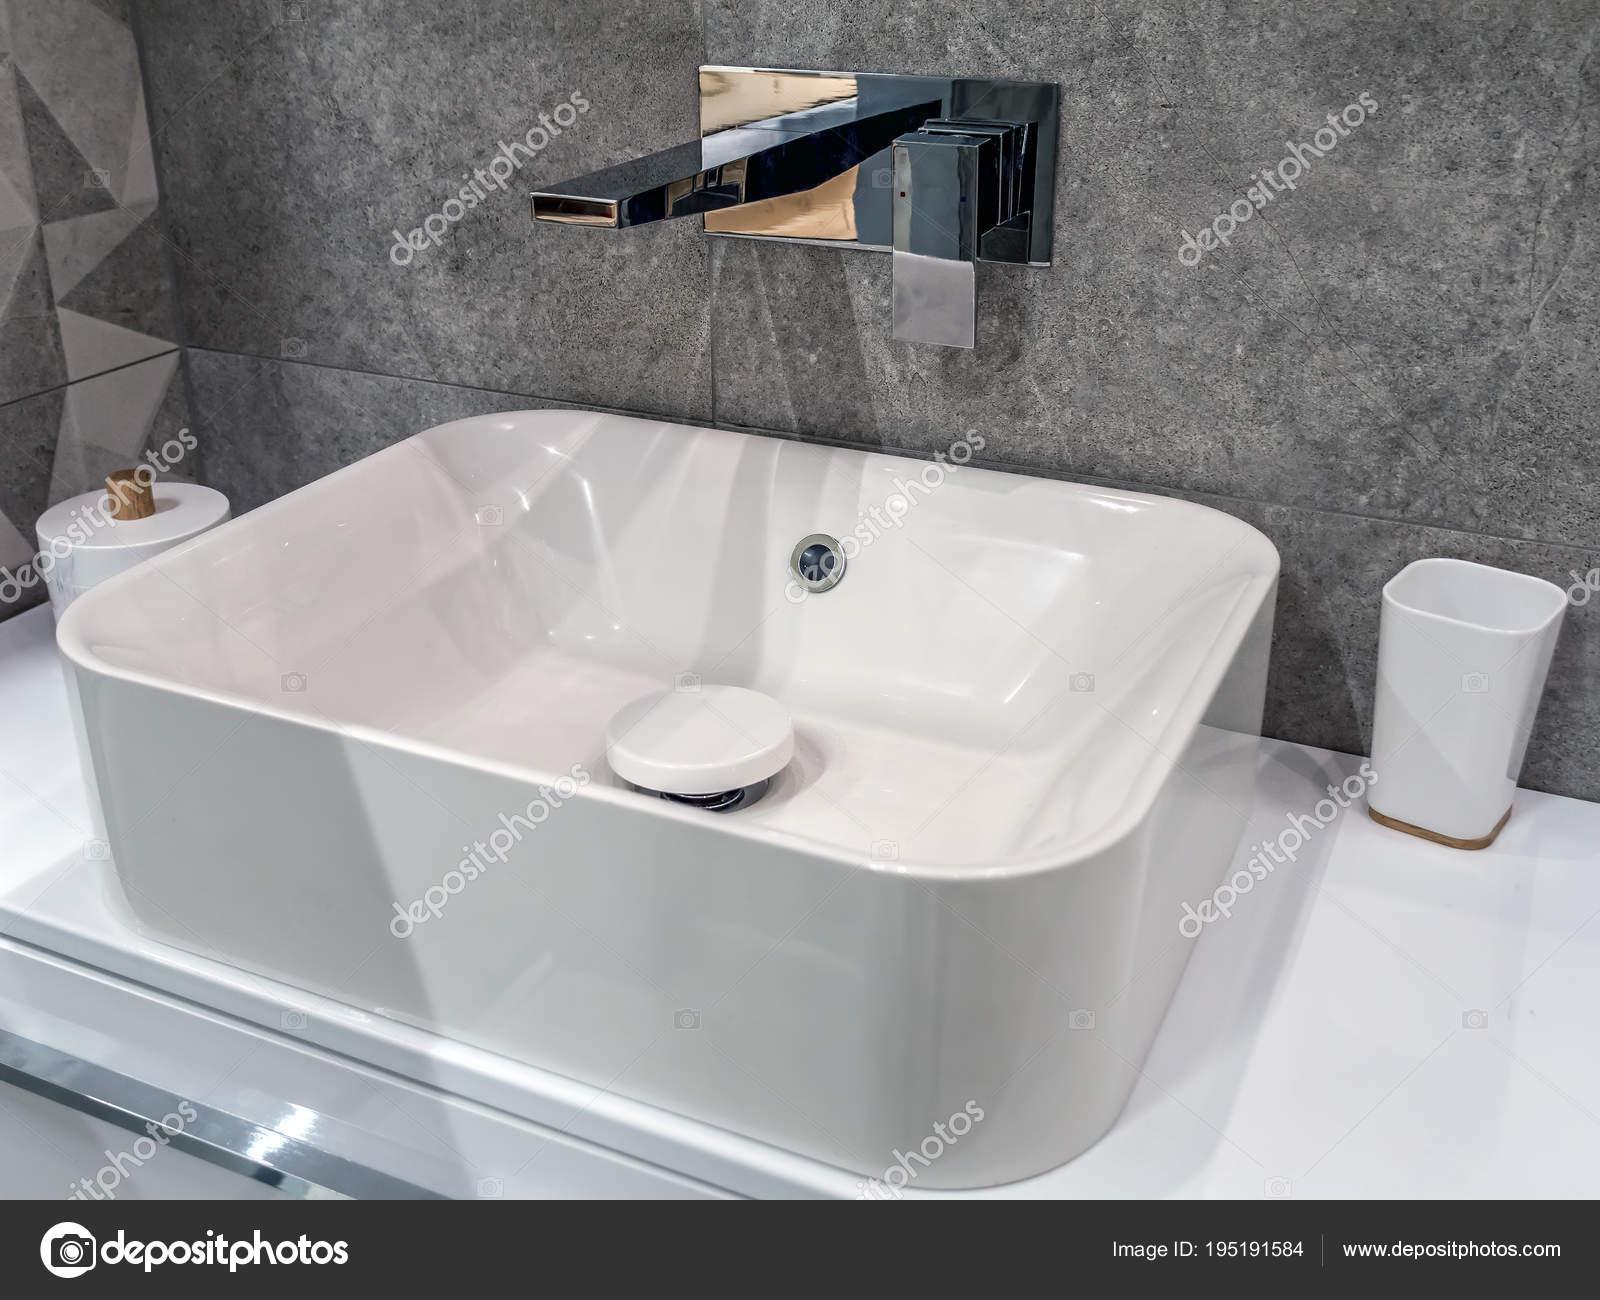 Lavabo bagno moderno u foto stock pryzmat